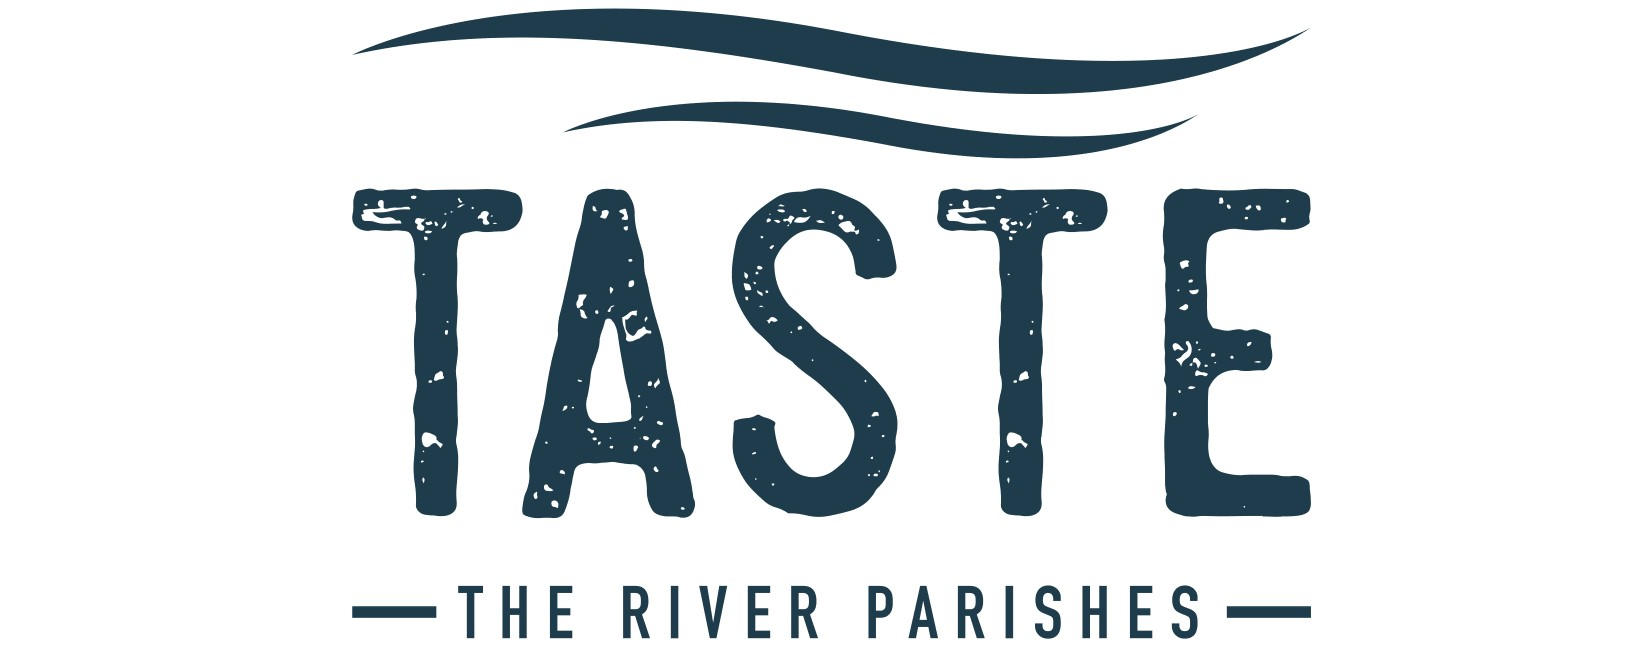 tastetheriverparishes